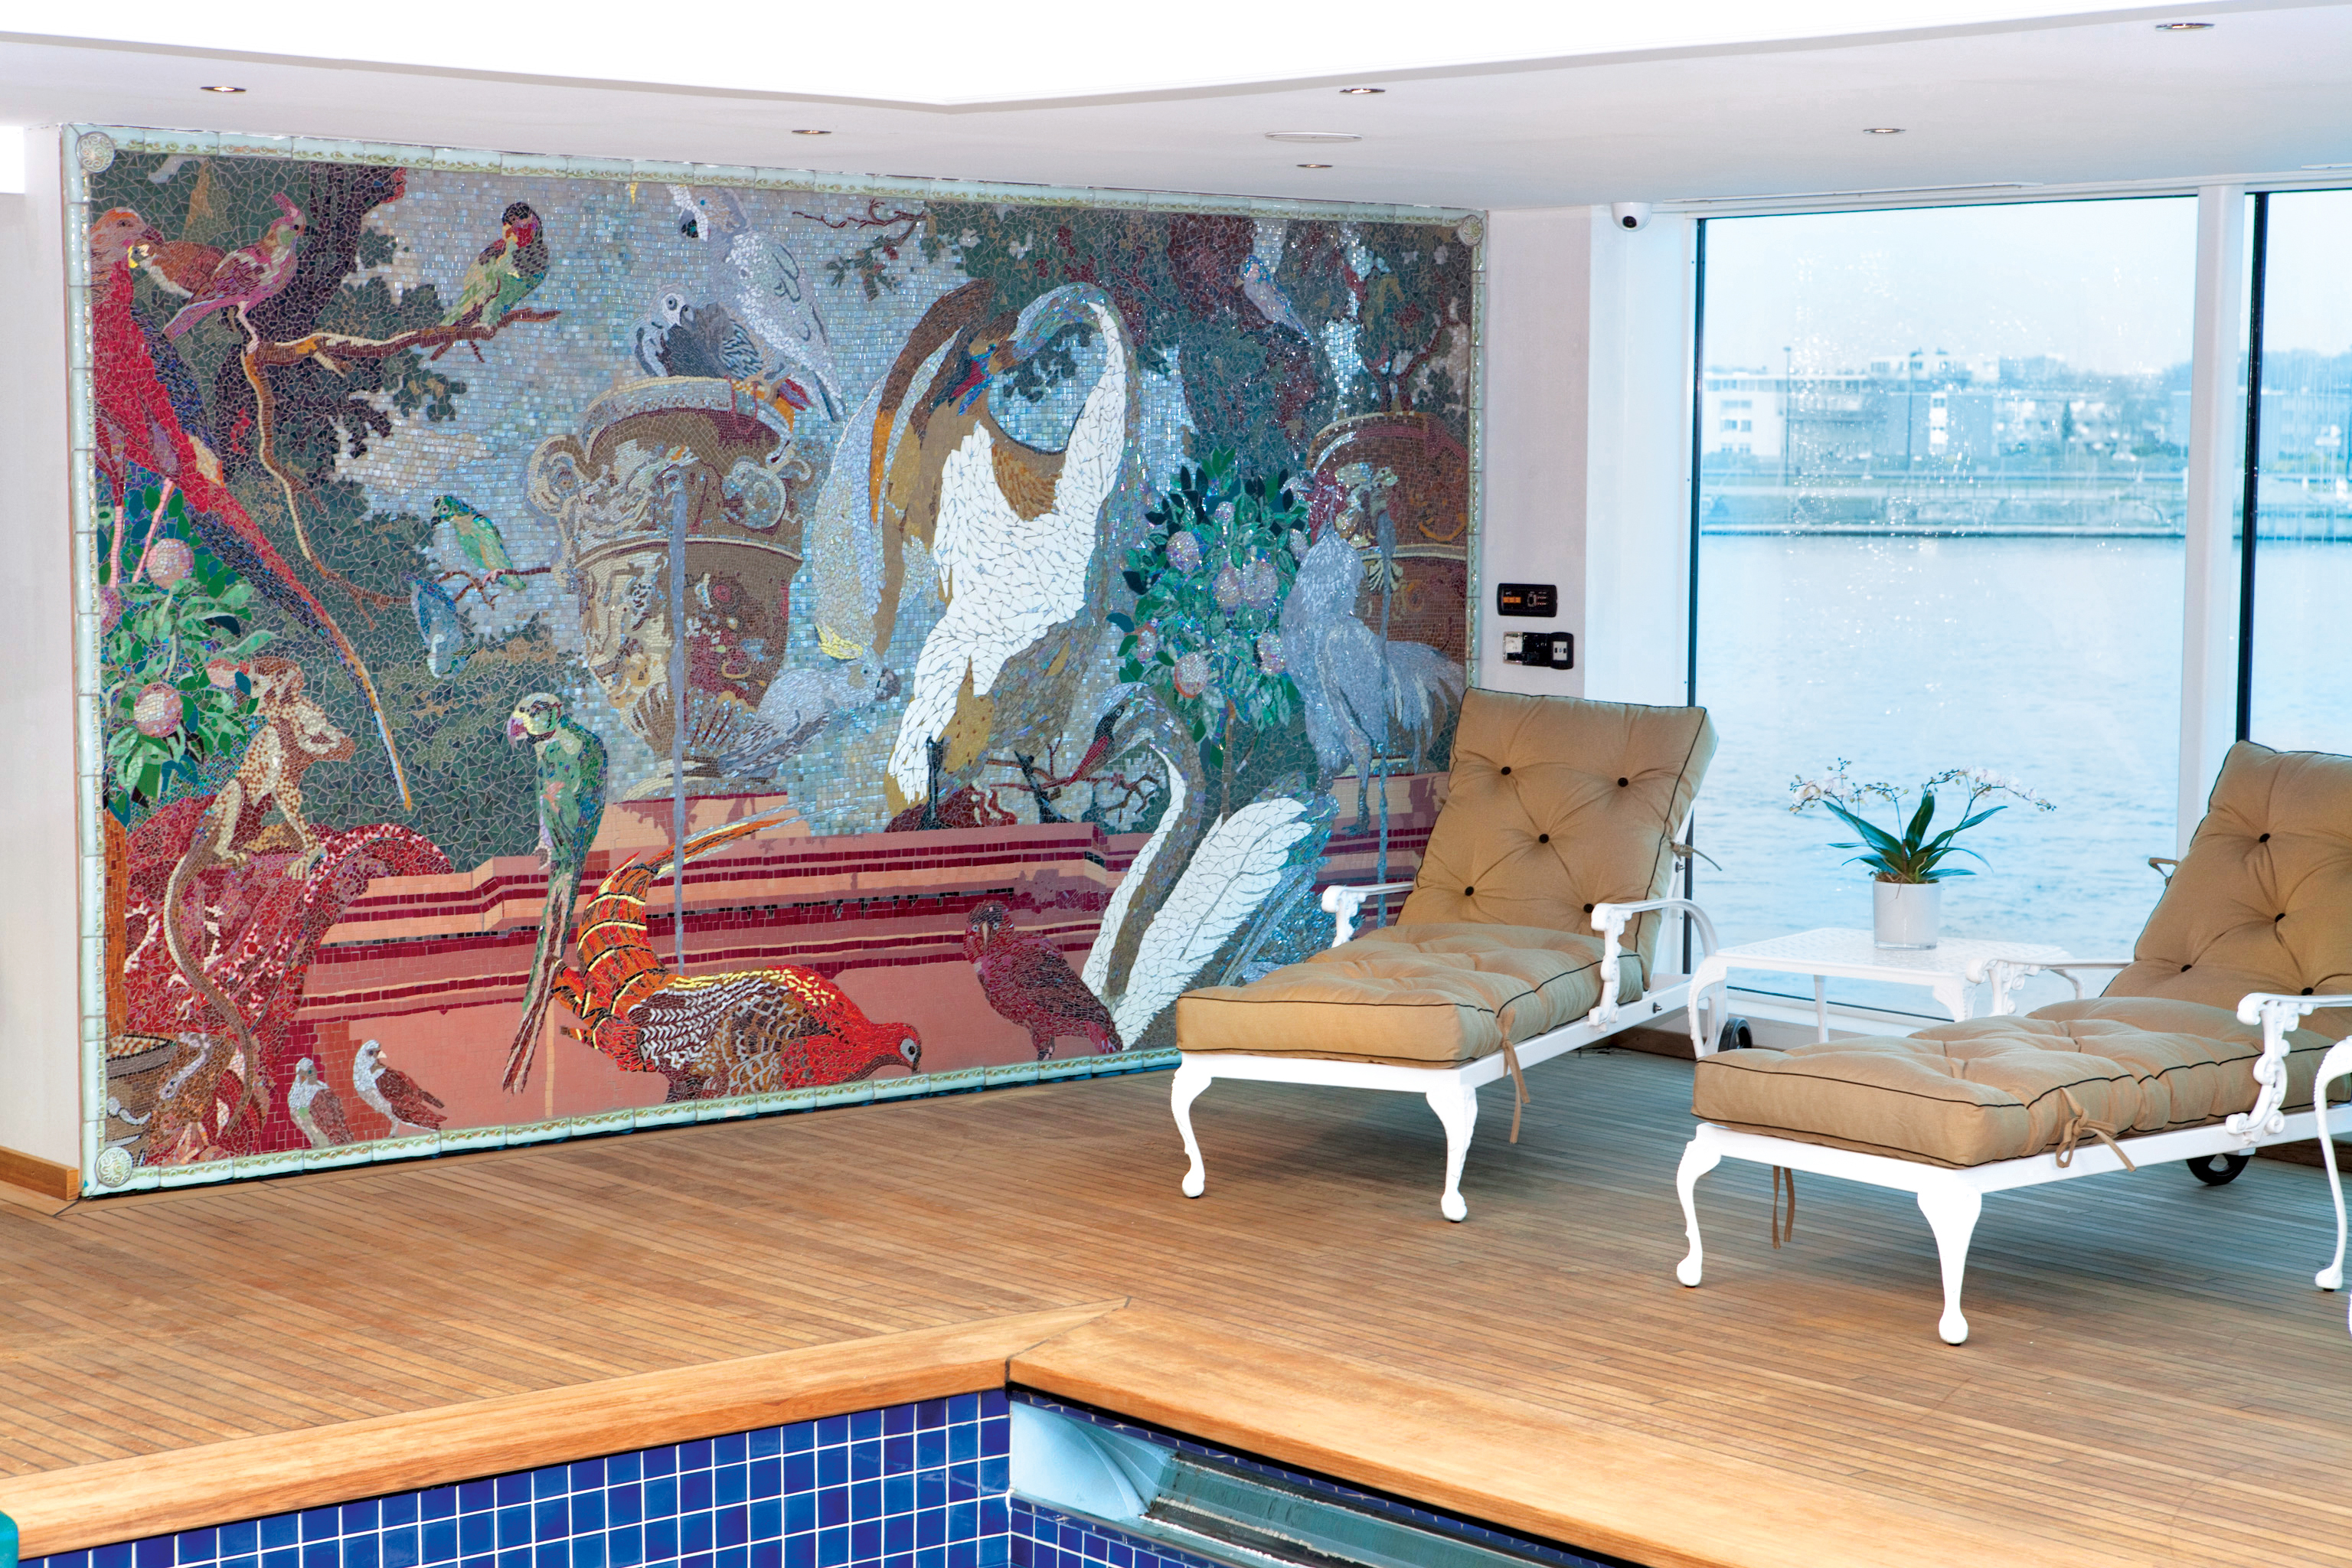 UNIWORLD Boutique River Cruises SS Antoinette Interior Pool 4.jpg